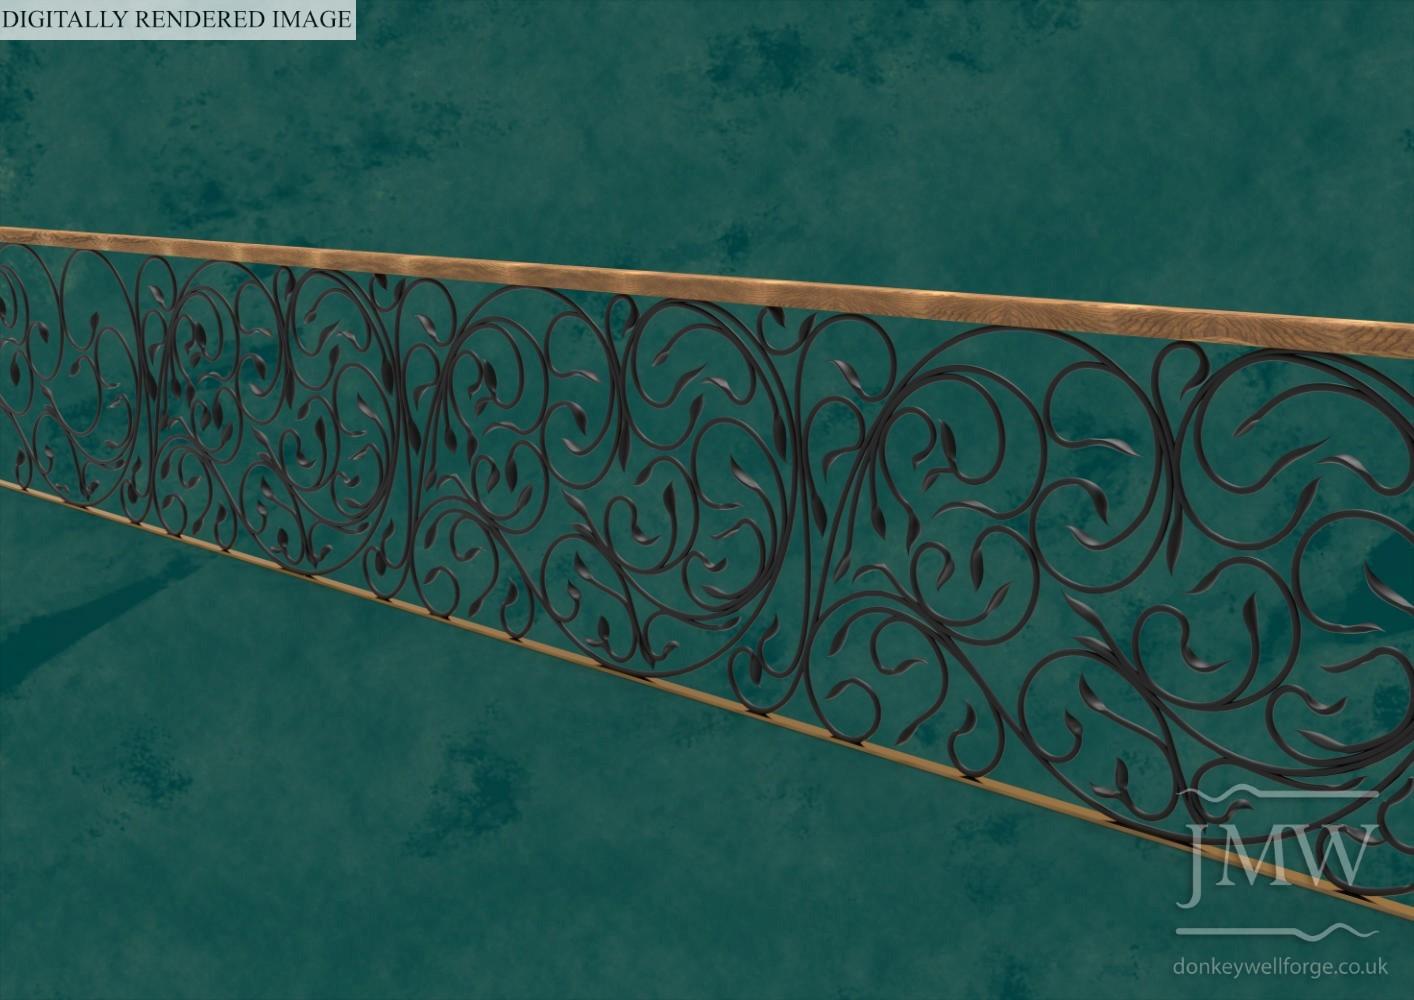 digitally-rendered-image-decorative-railing-balustrade-forged-ironwork-architectural